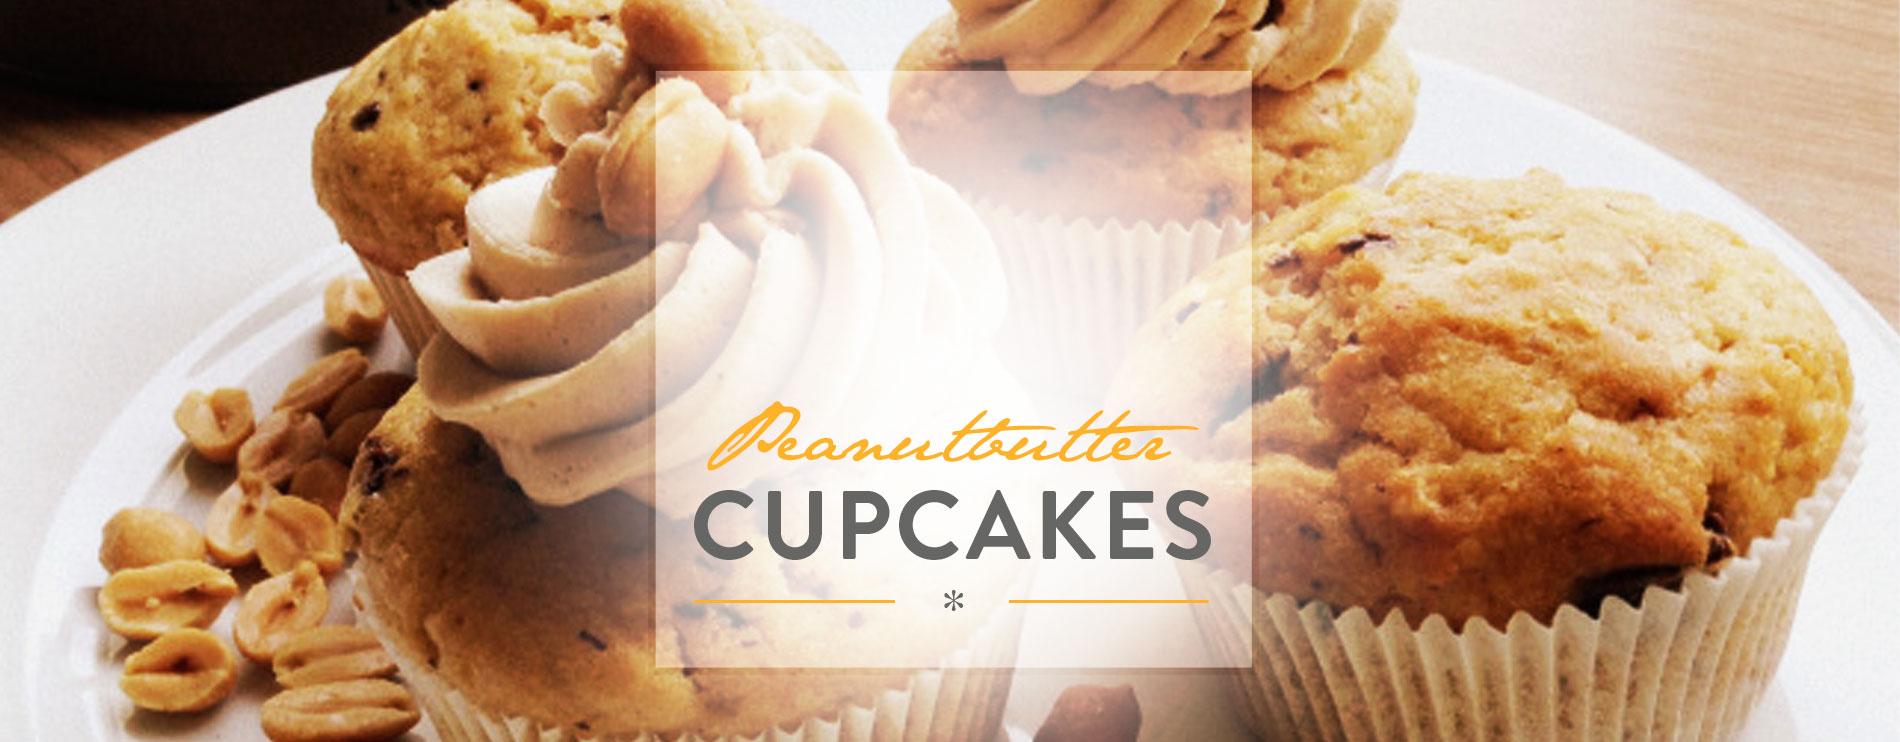 Header Peanutbutter Cupcakes